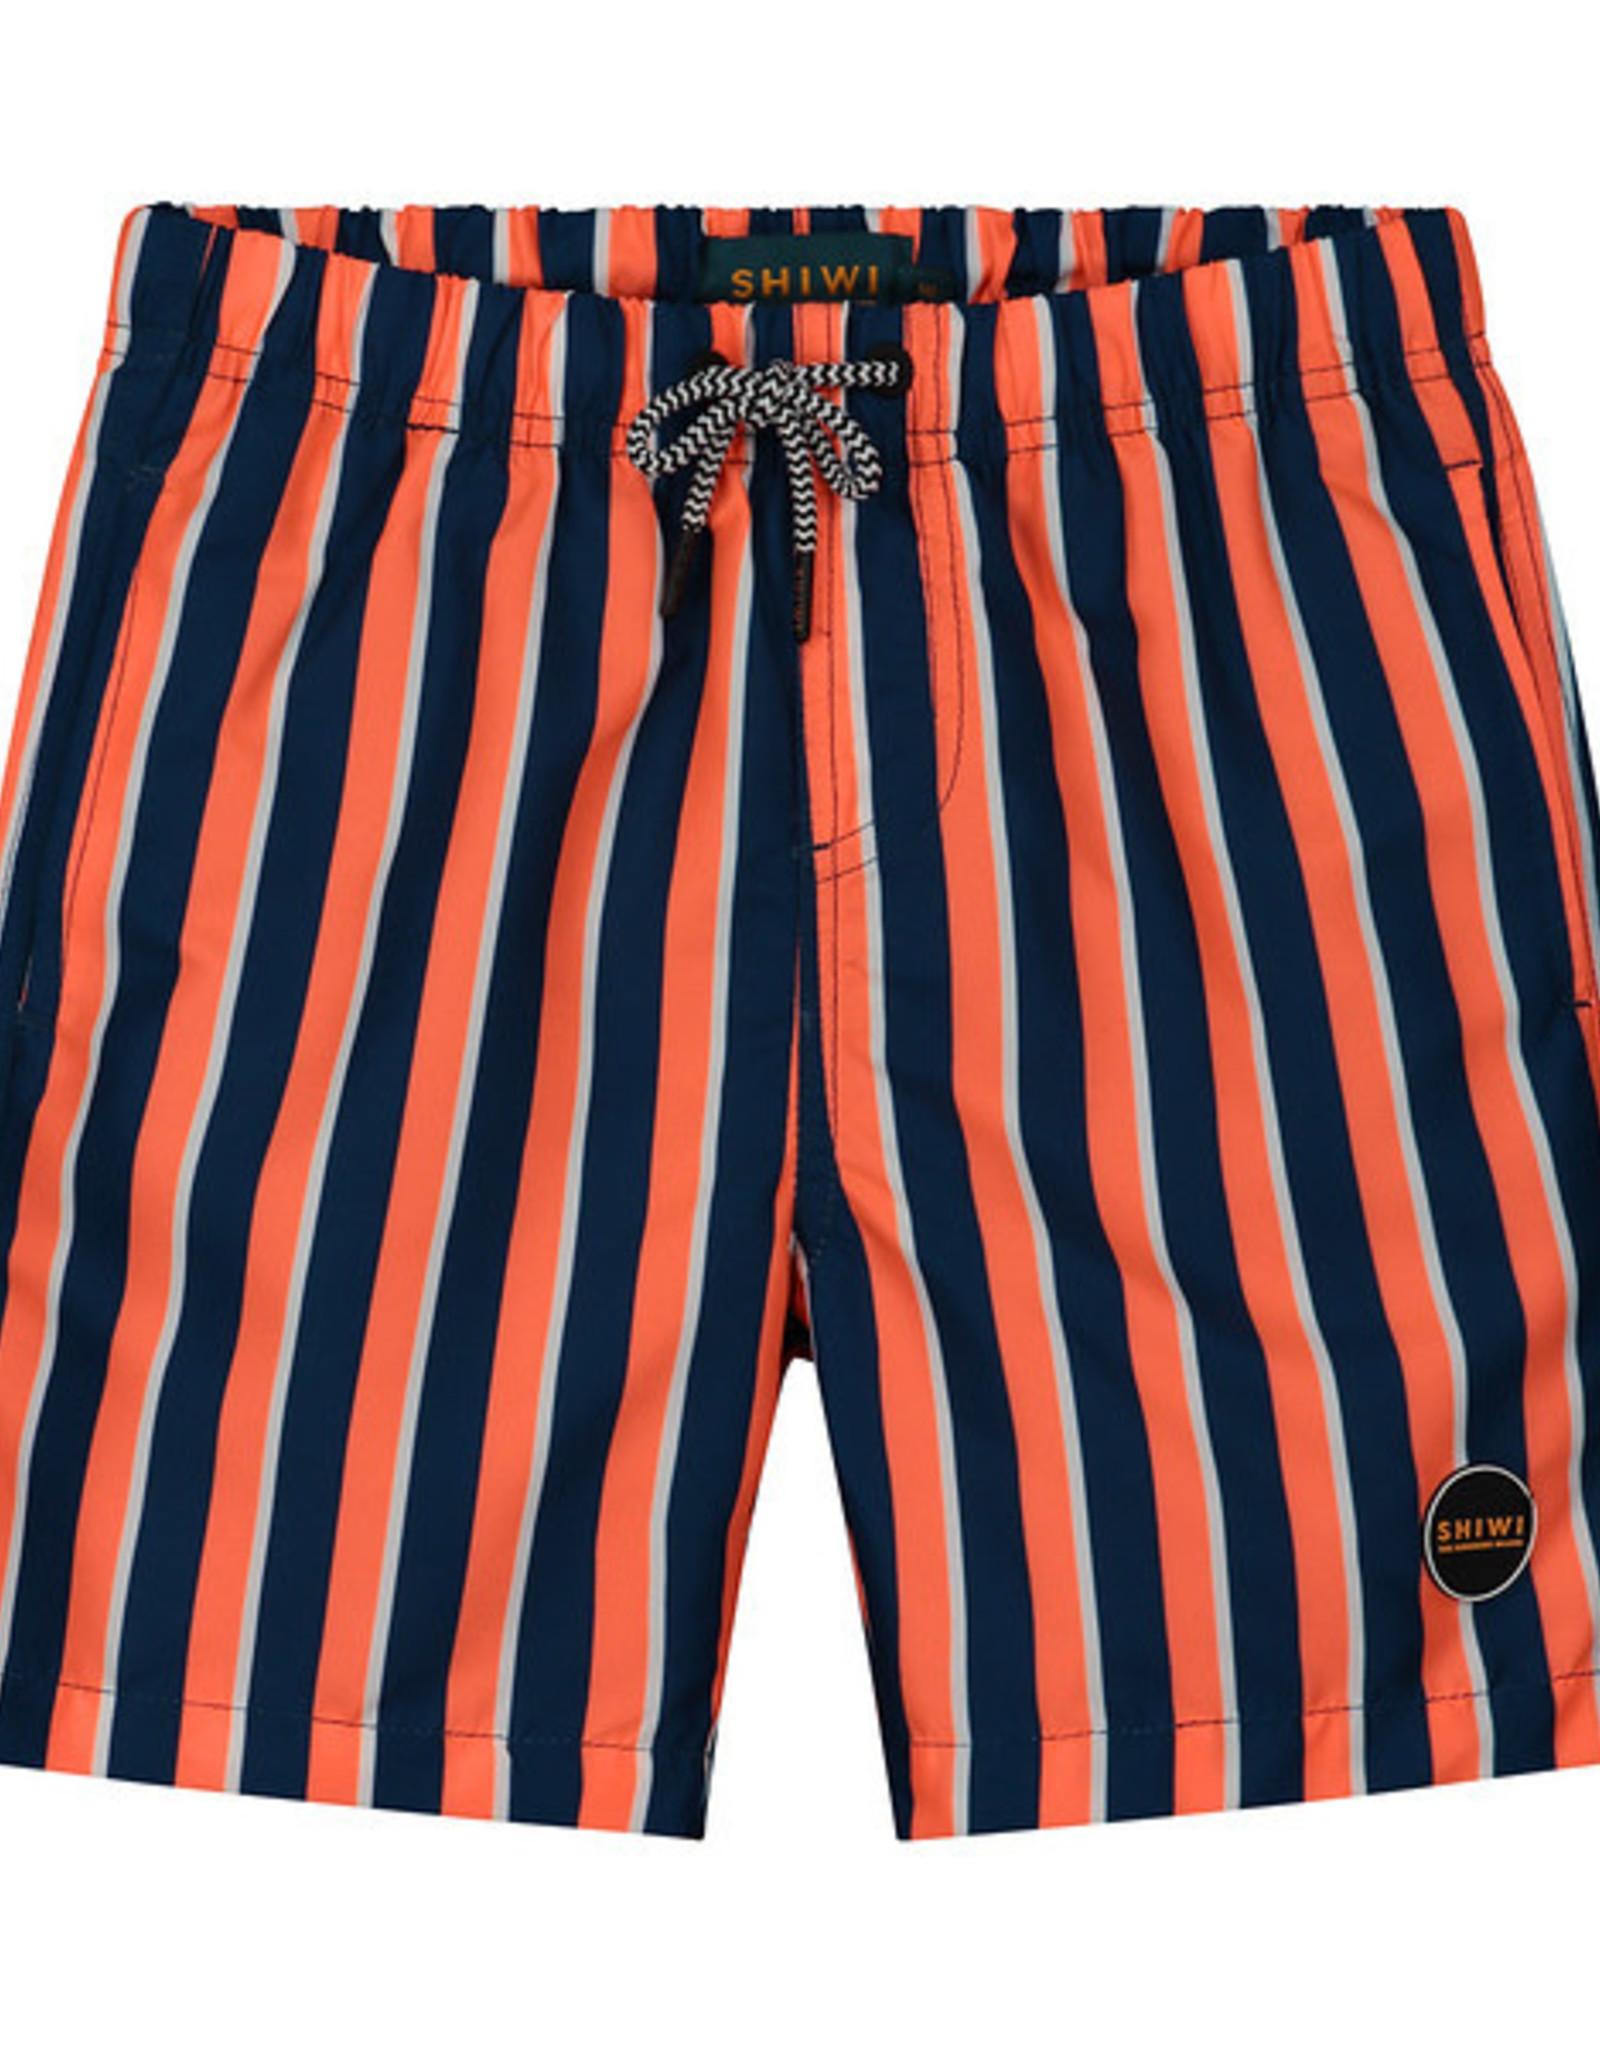 Shiwi Shiwi zwemshort midi stripe neon orange